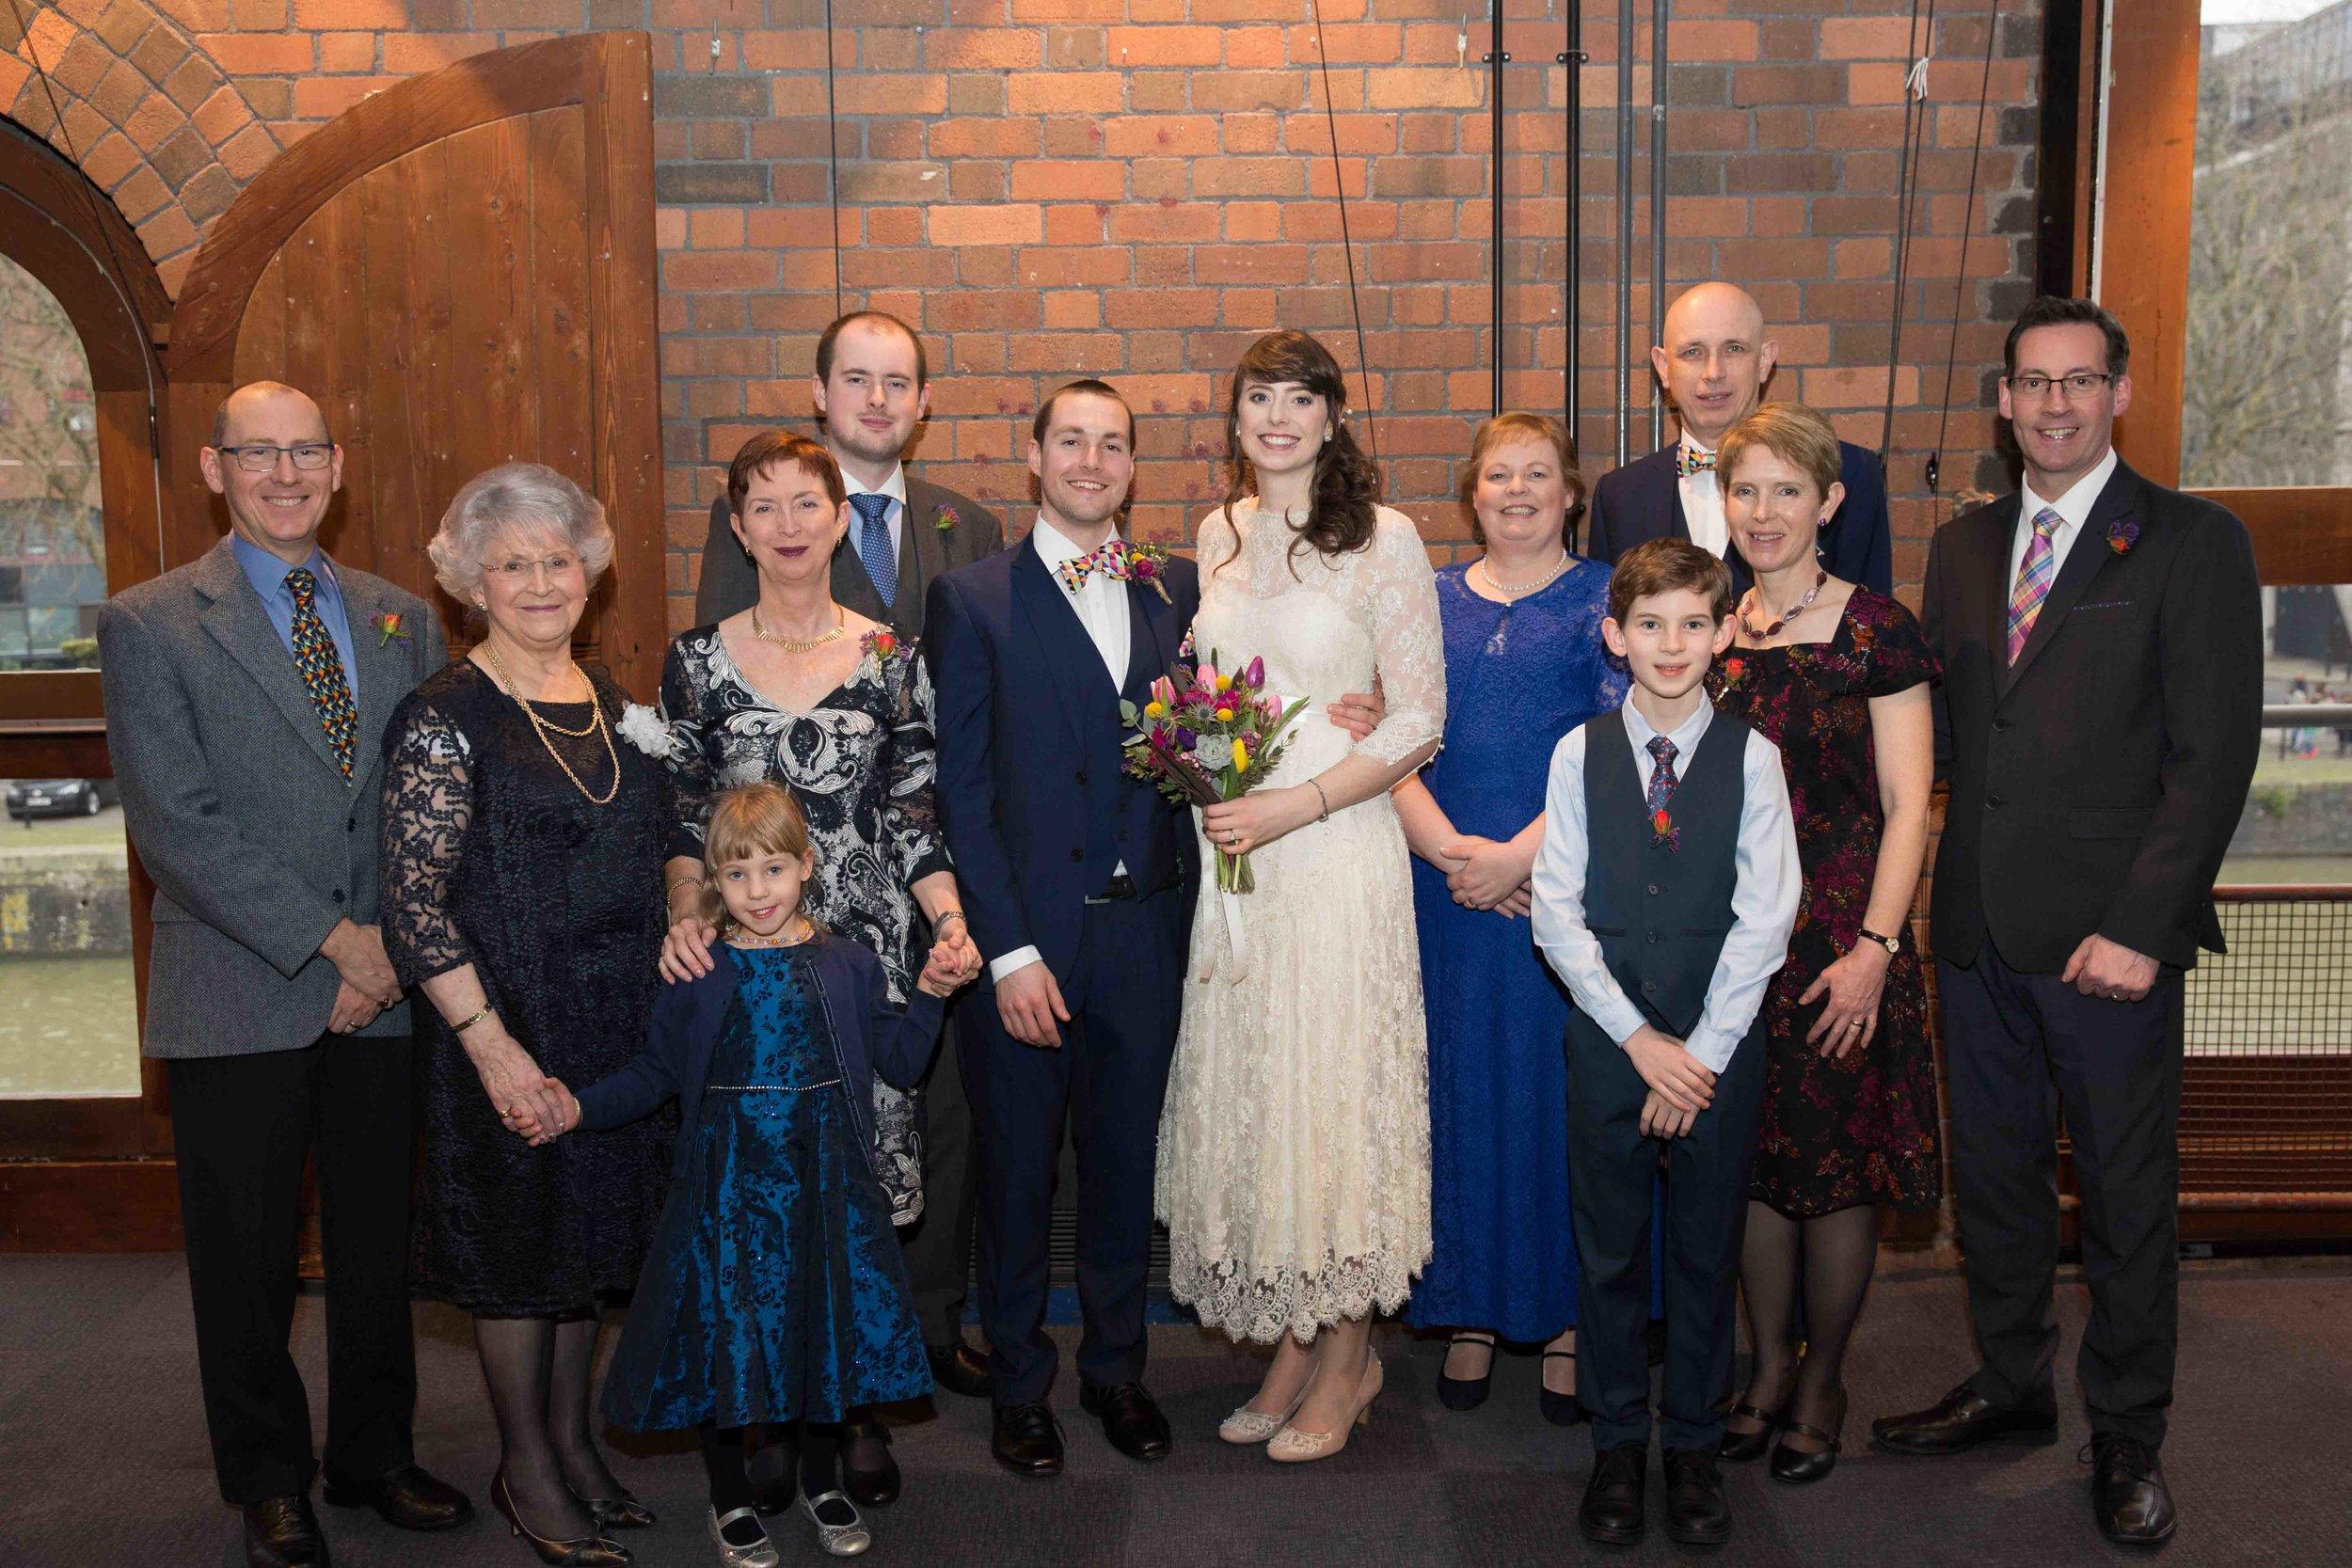 Adam & Faye - Wright Wedding Photography - Bristol Wedding Photographer -204.jpg